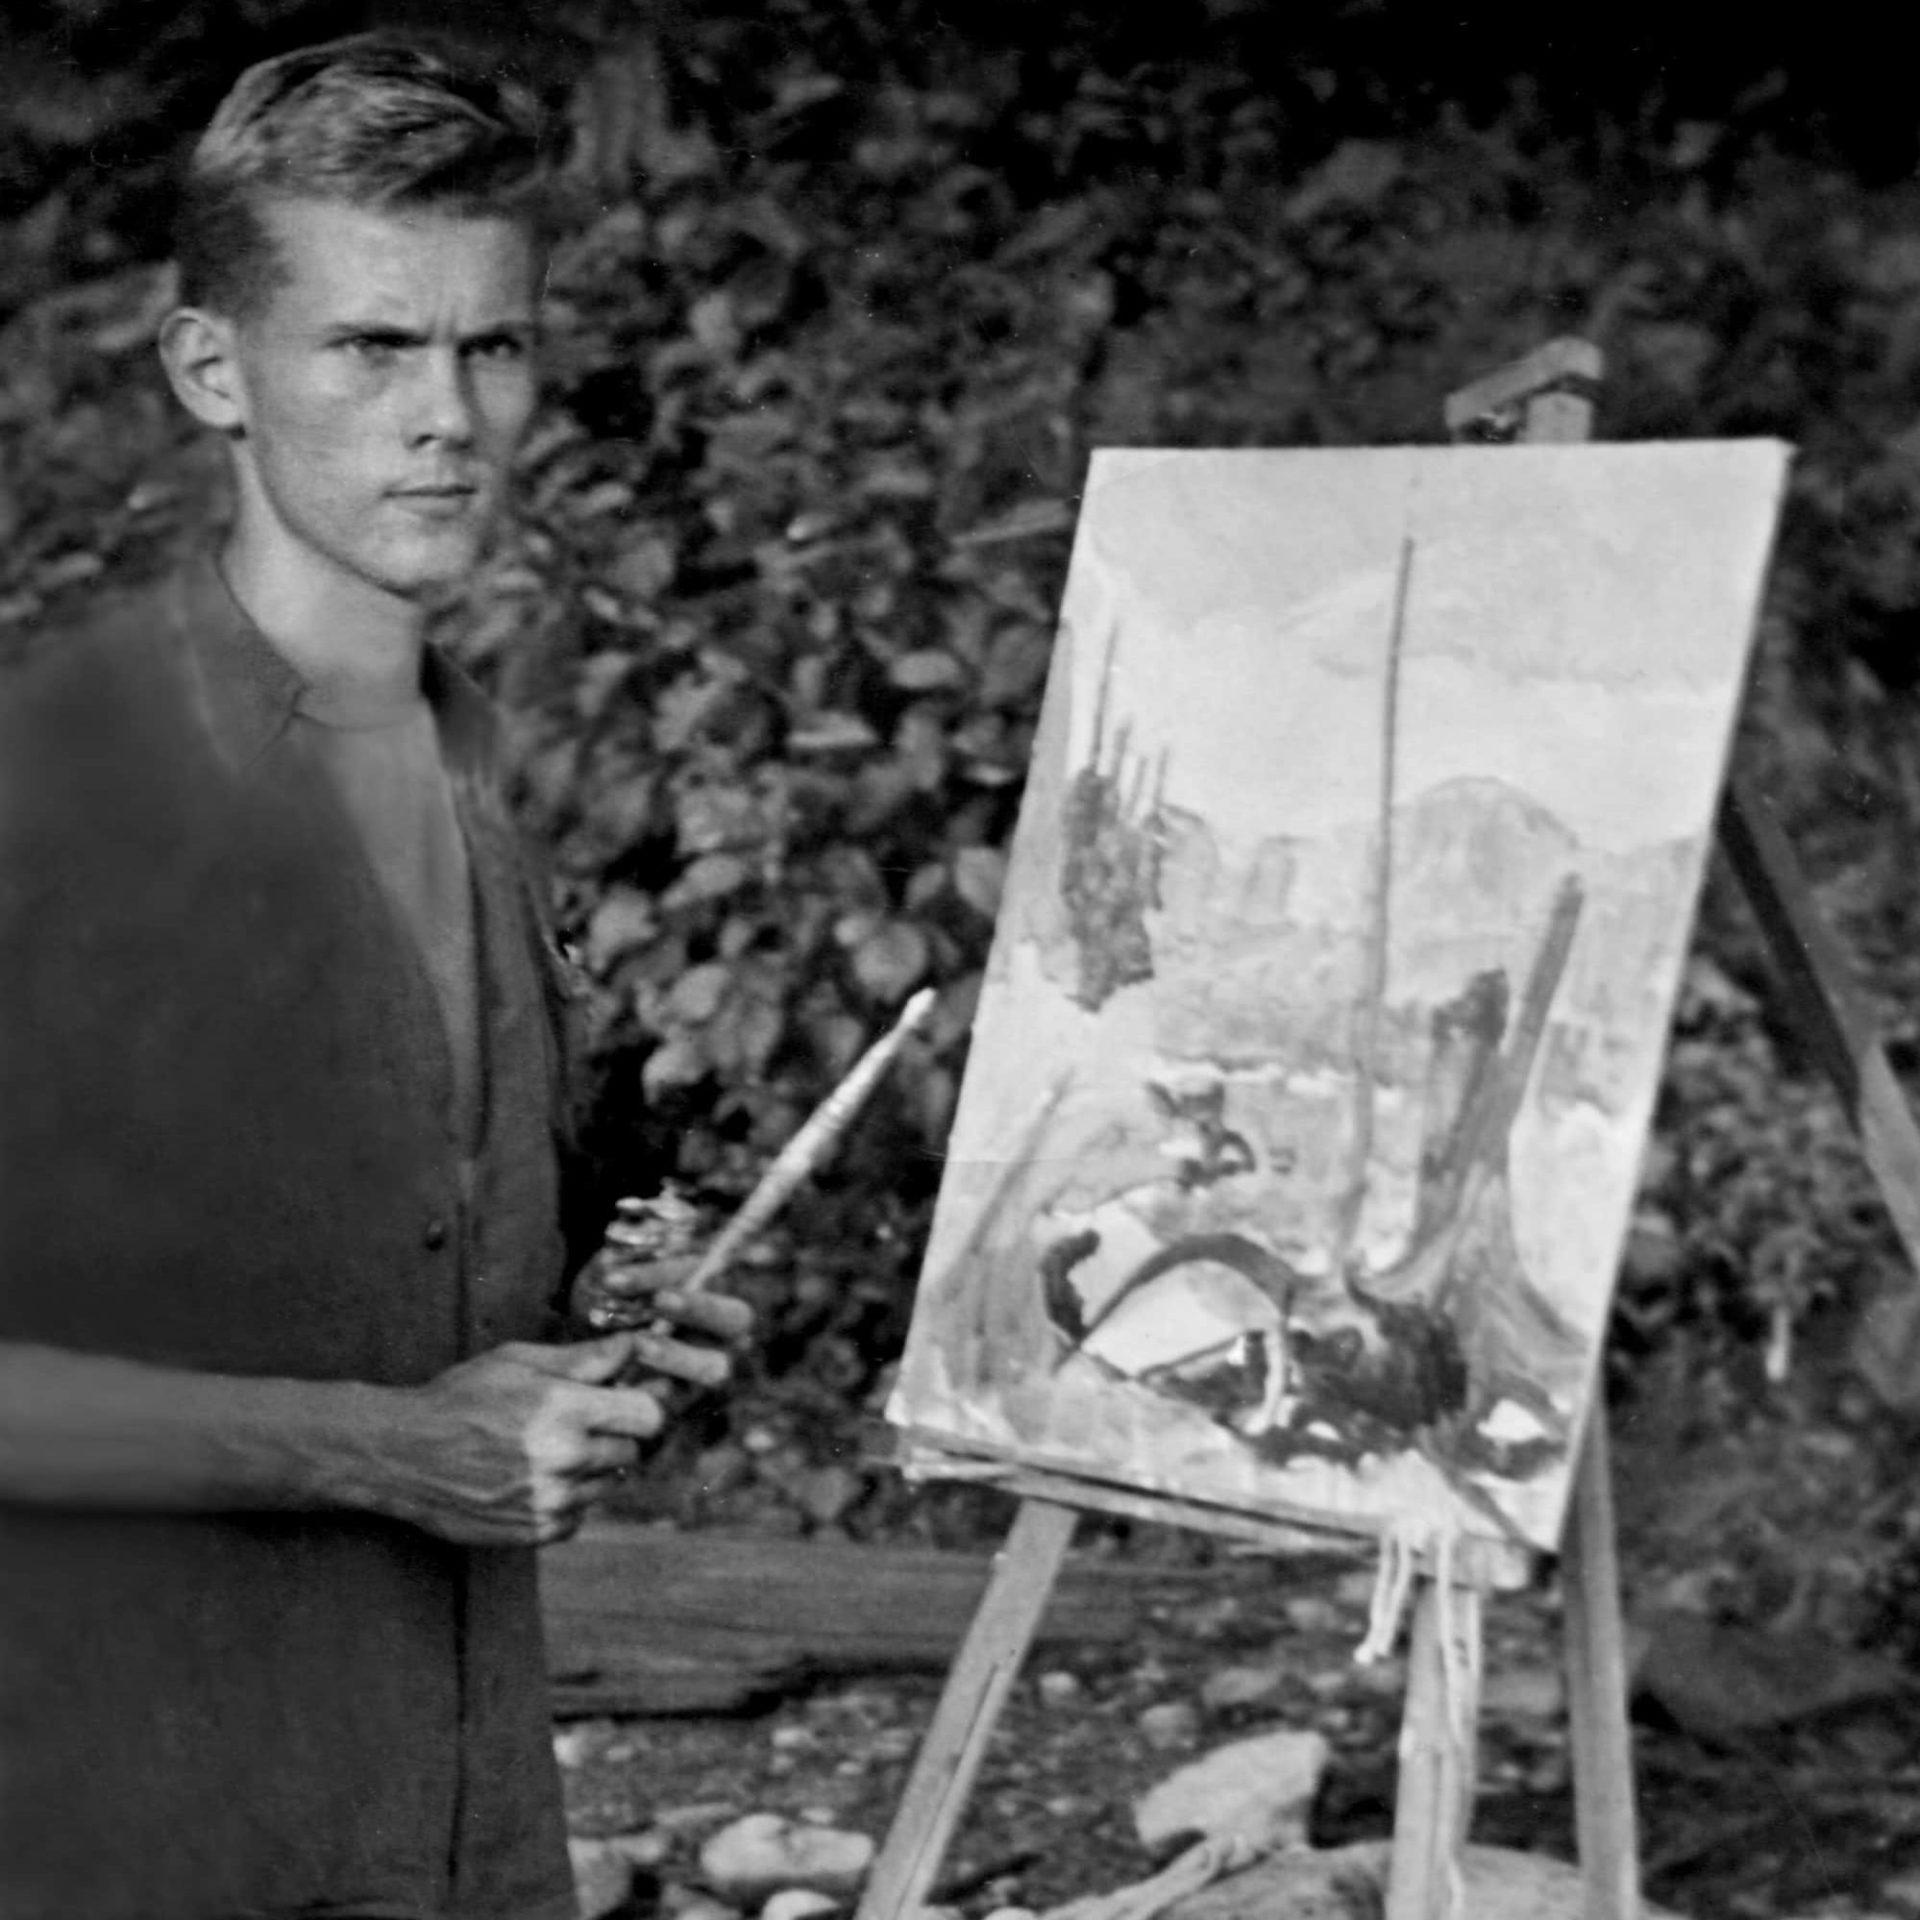 Robert Bateman, Algonquin Park Ontario, 1948